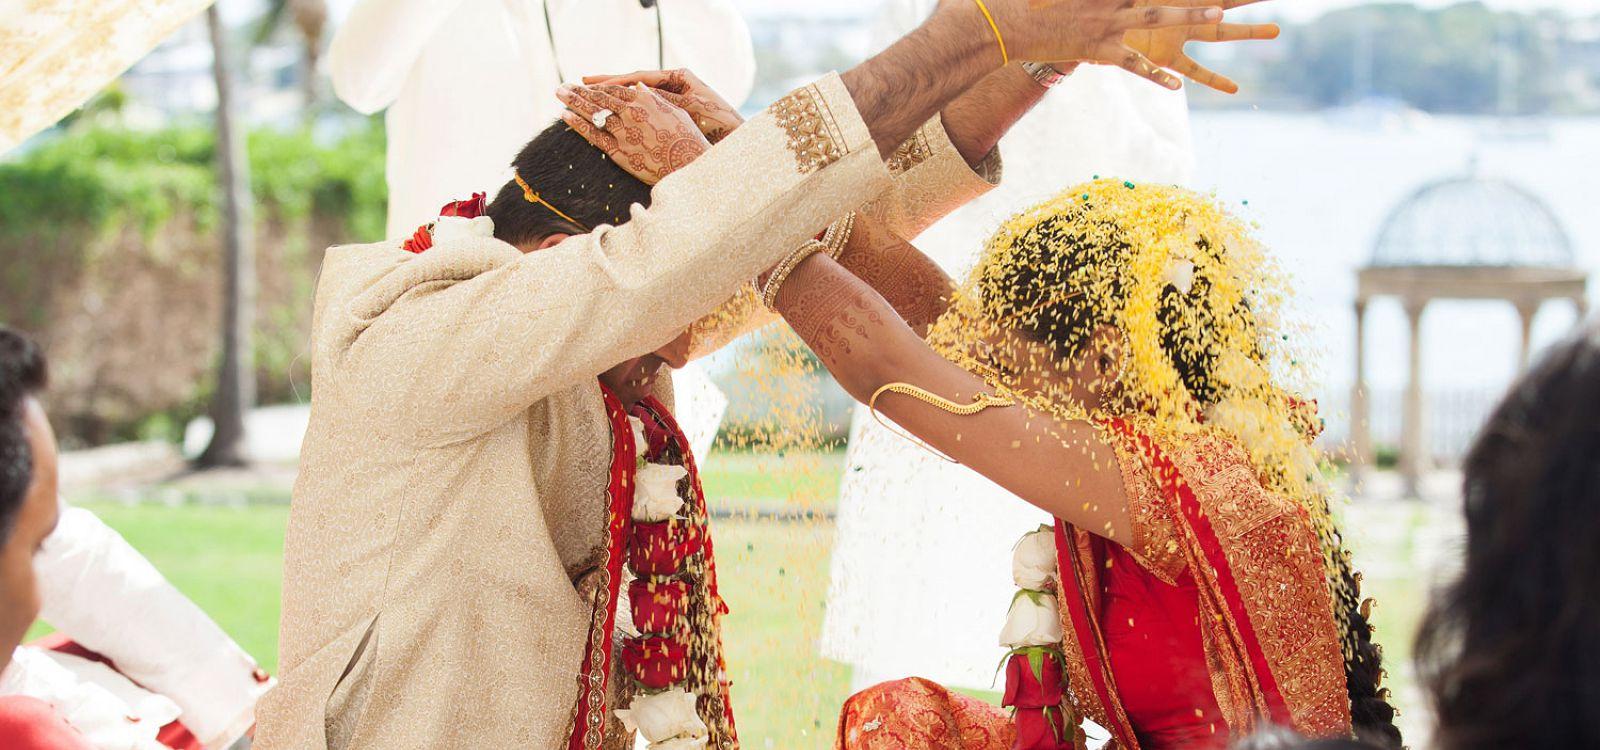 1956052cc5c87 Indian Weddings at Pyaar Atlantis | Atlantis Paradise Island